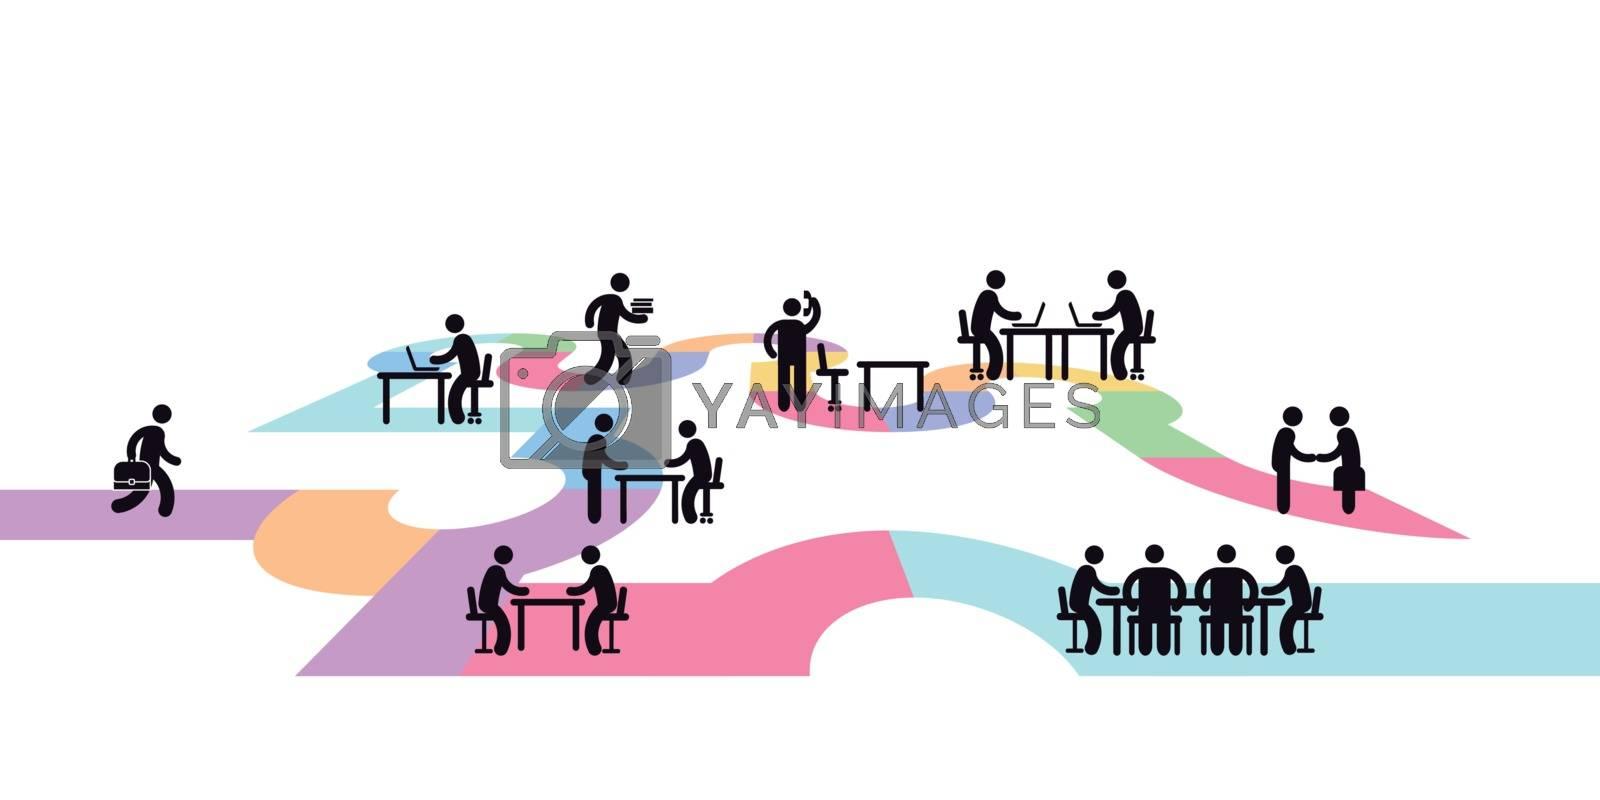 Workplace concept, pictogram illustration